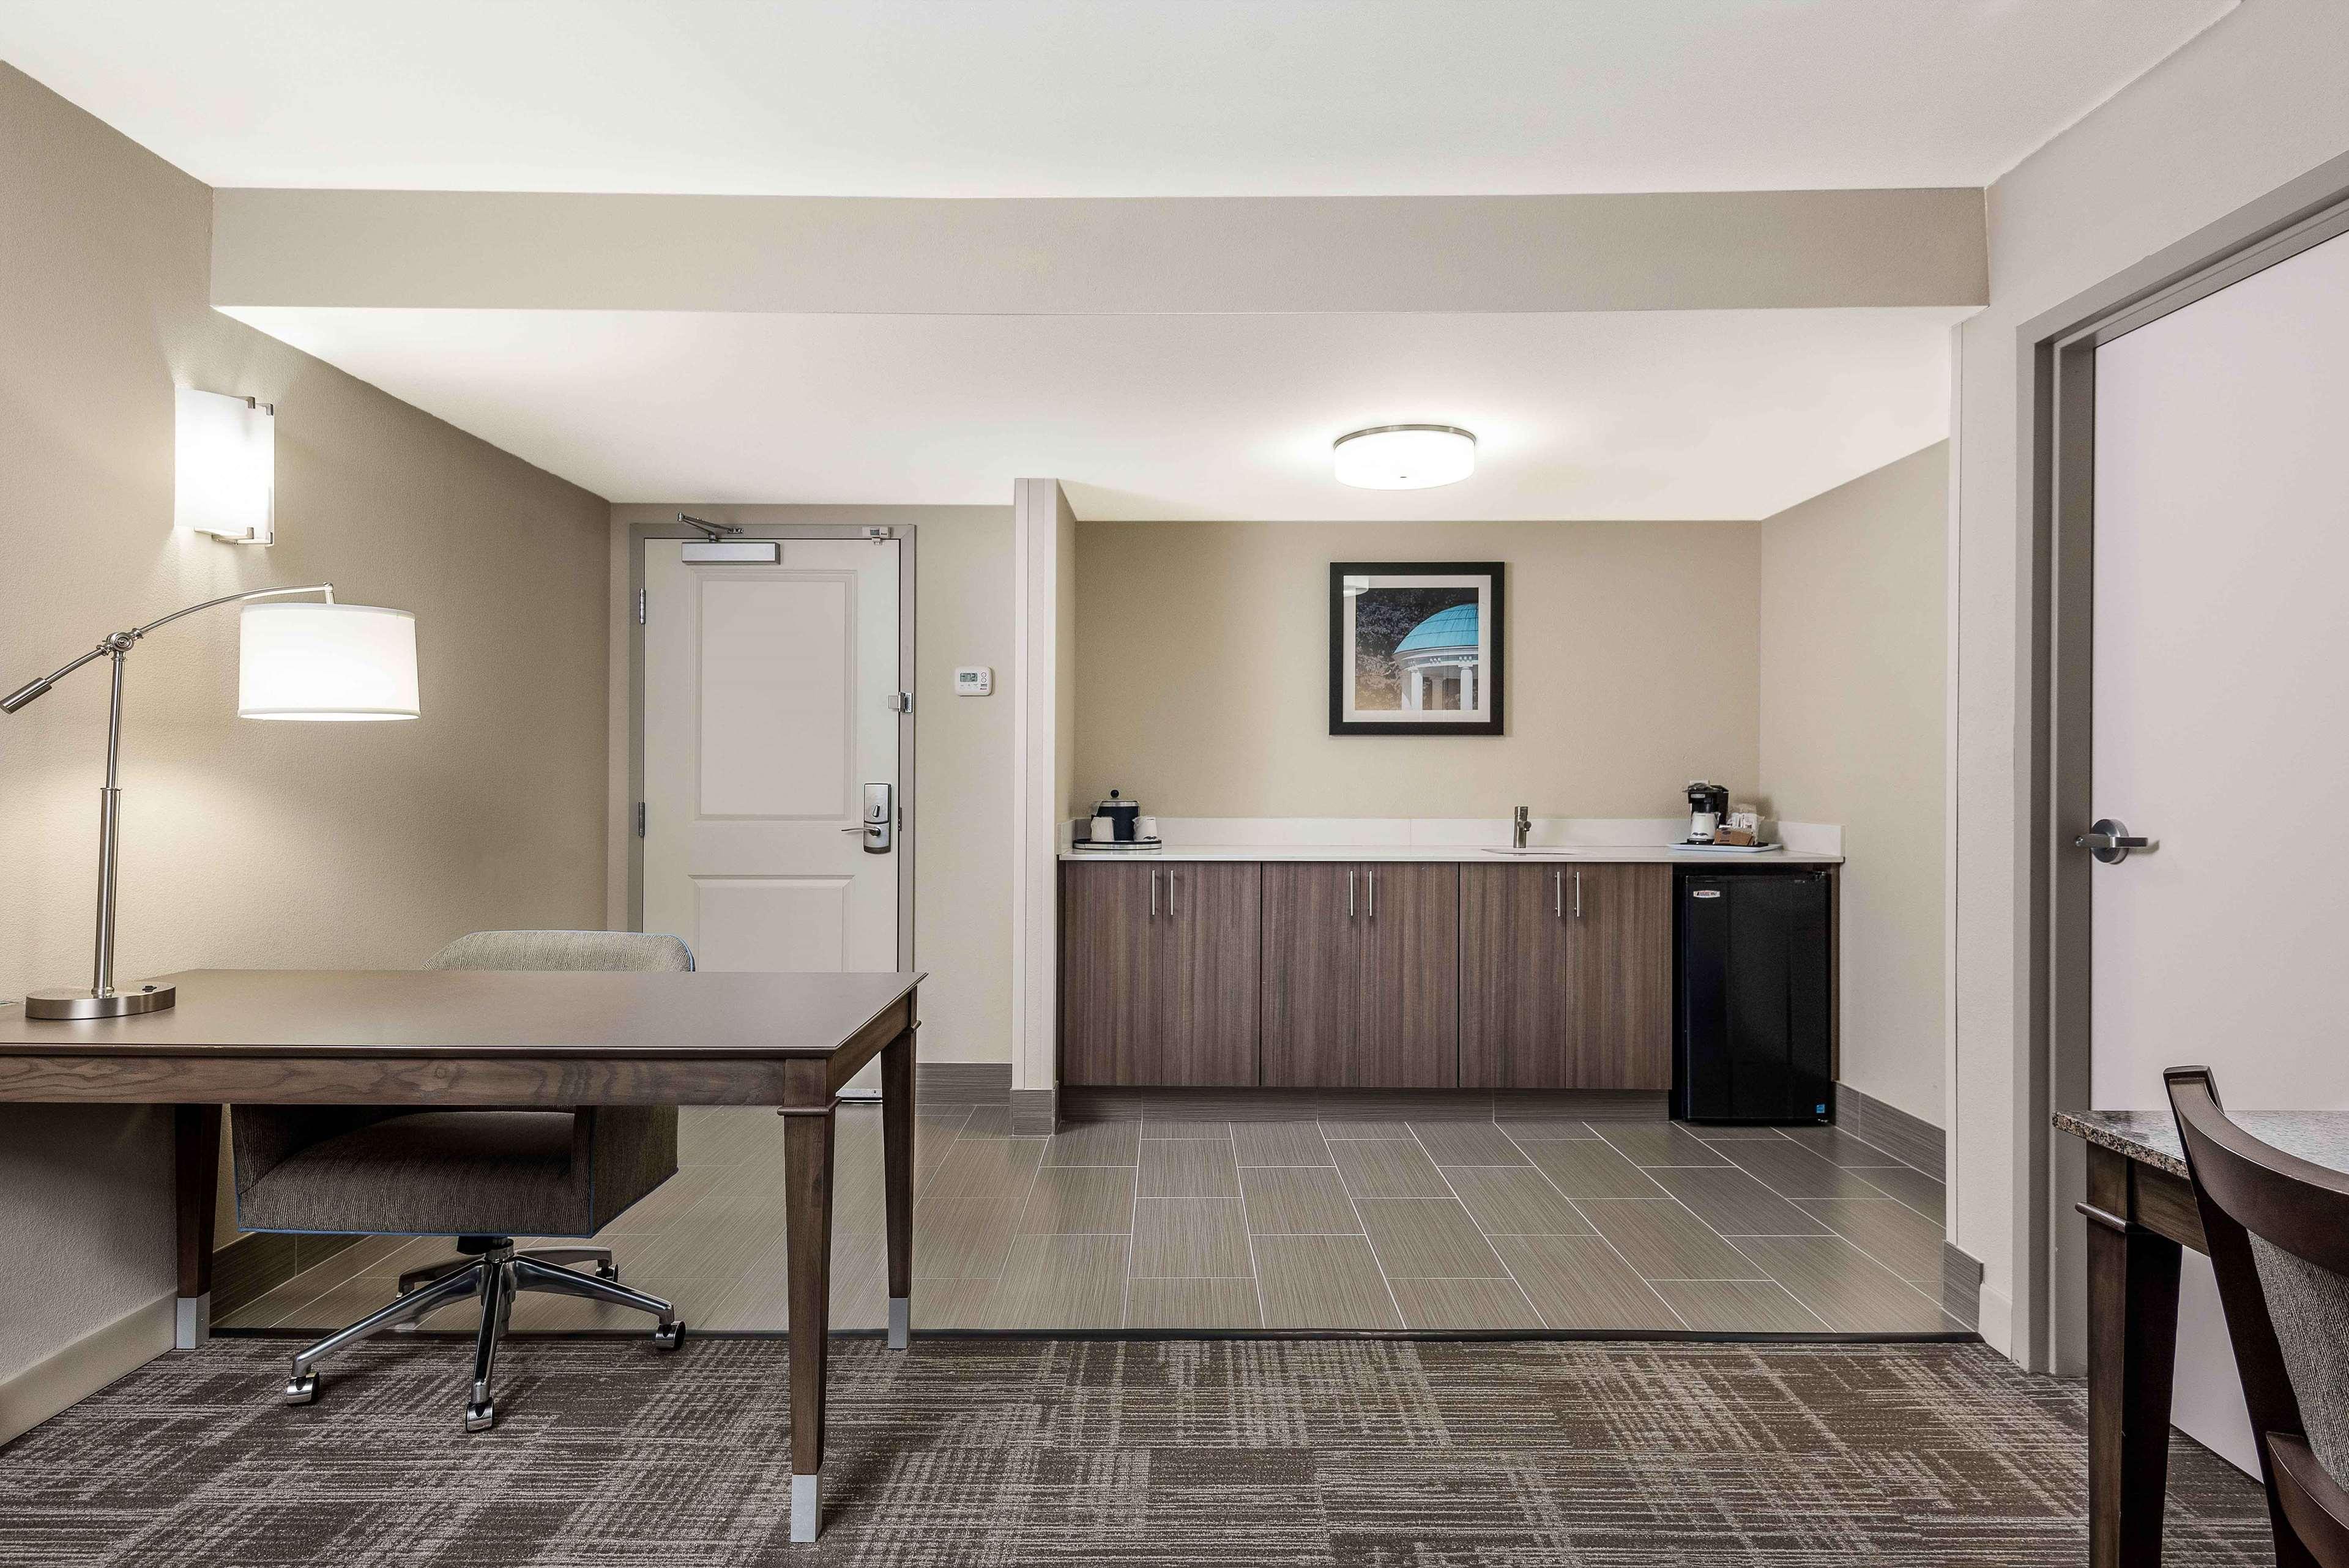 Hampton Inn & Suites Chapel Hill/Durham, Area image 7